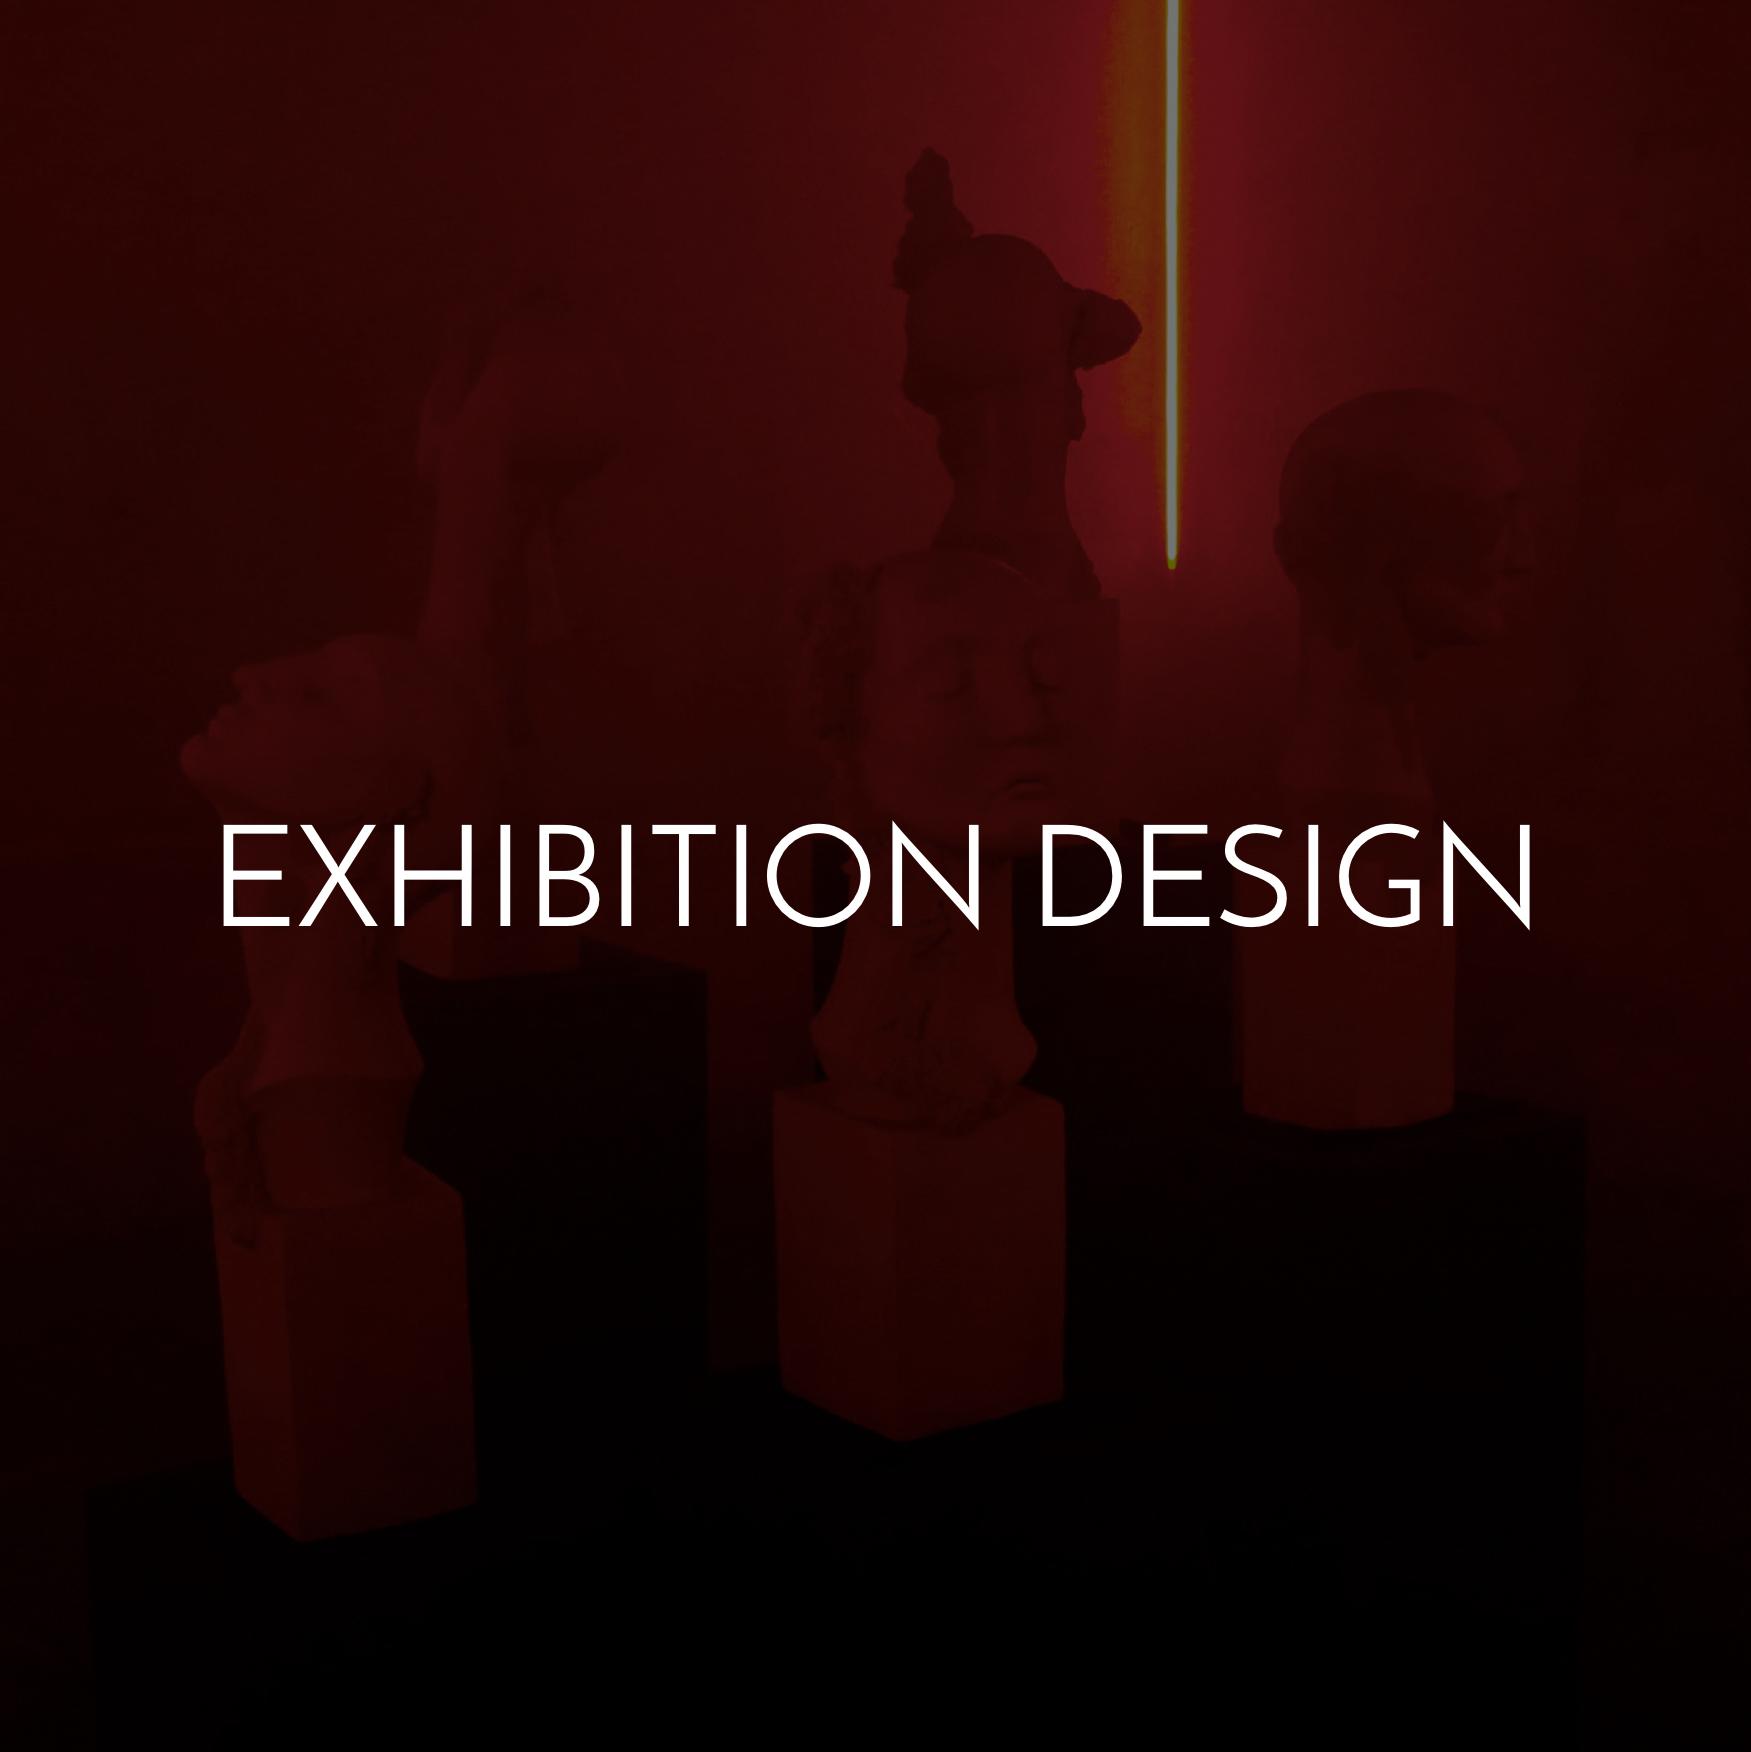 Exhibition and fair design in Milan